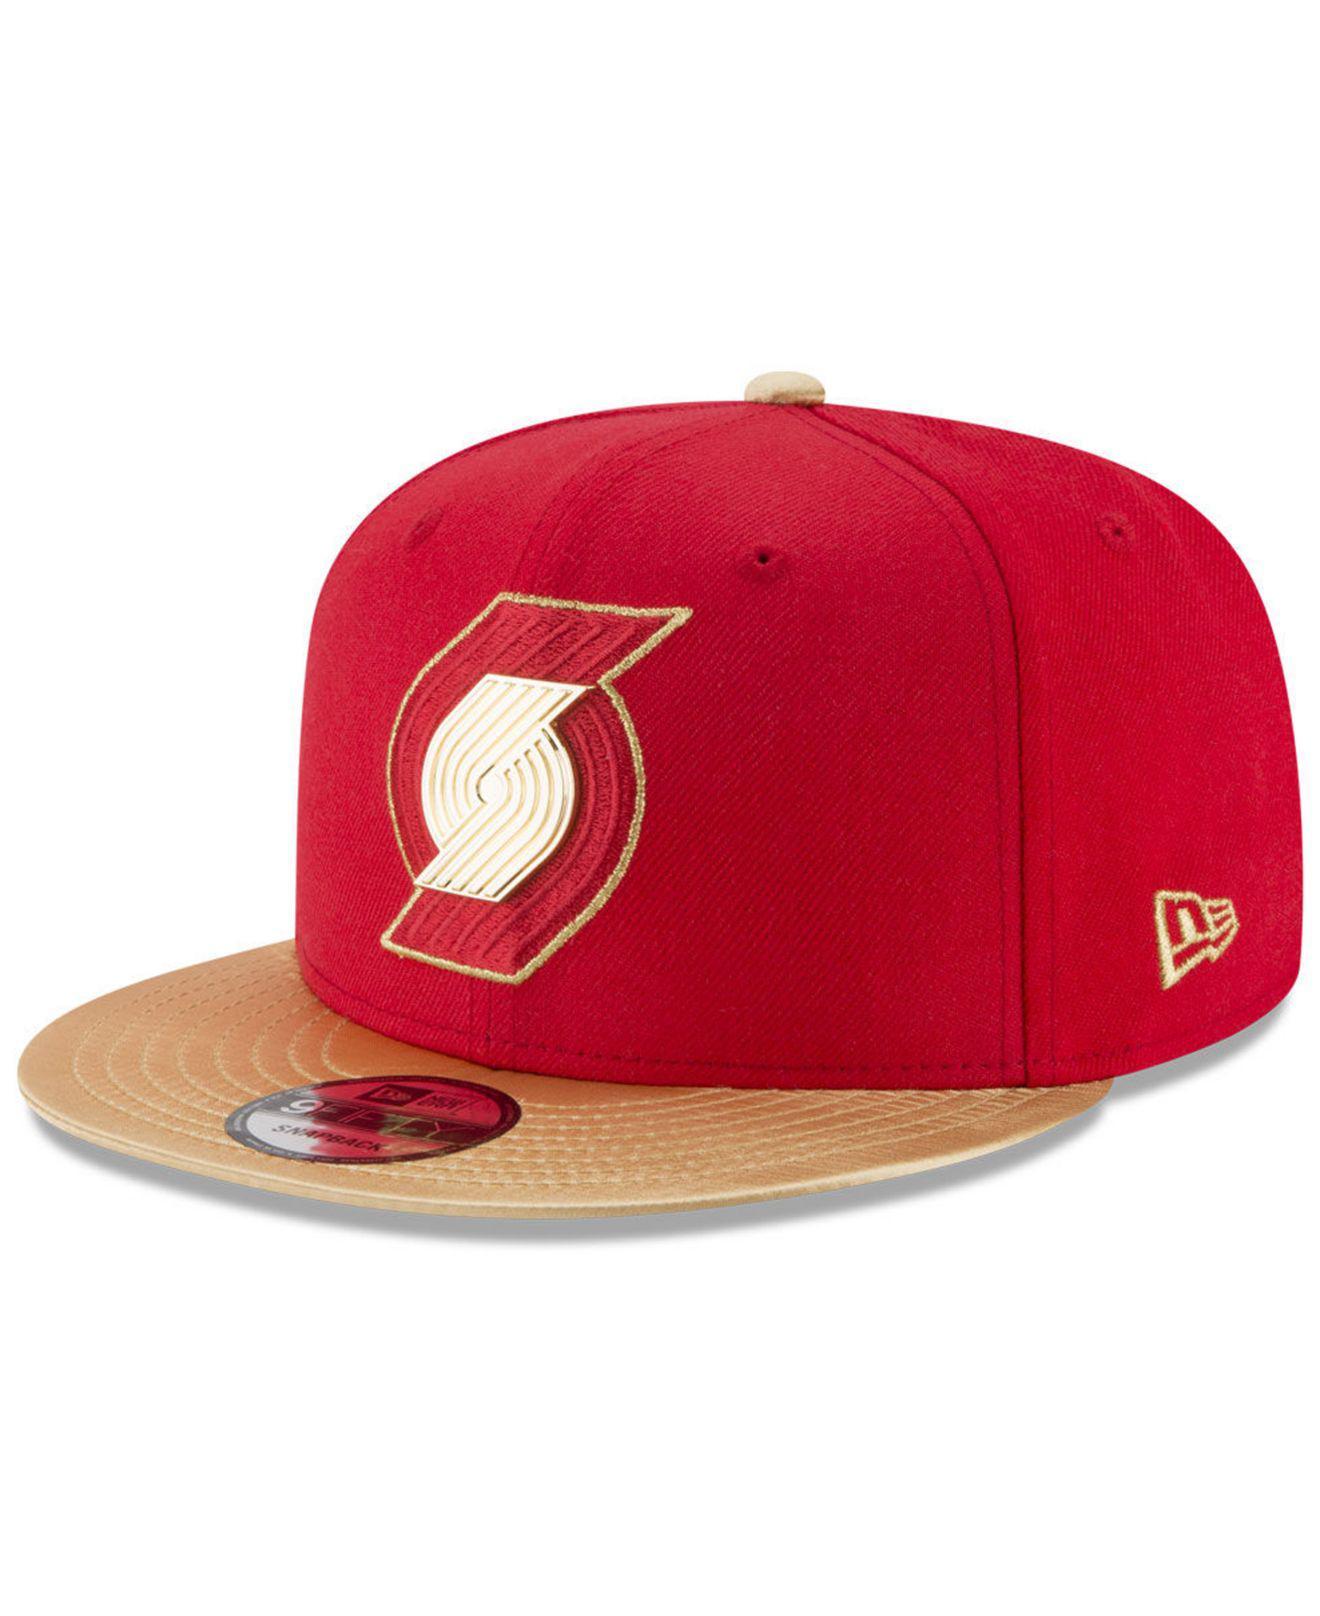 innovative design 658b3 d1f01 KTZ. Men s Red Triple Gold 9fifty Snapback Cap